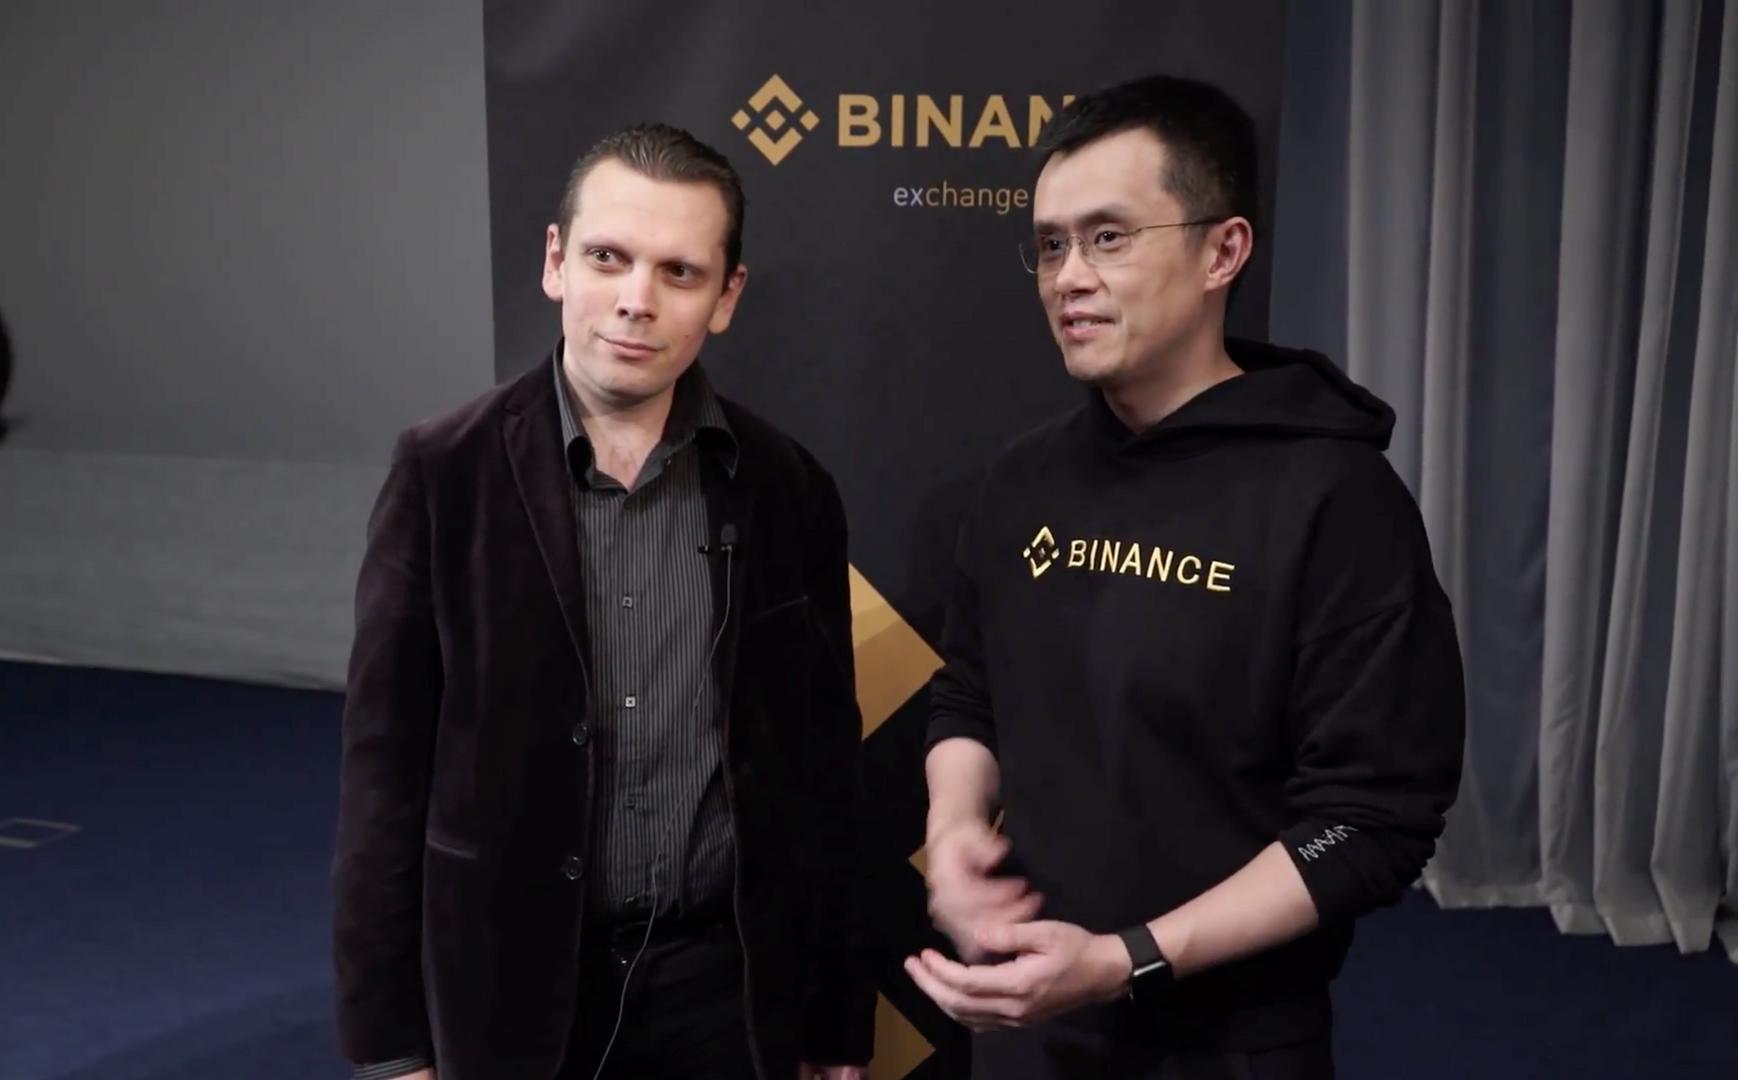 Sergey Binance3